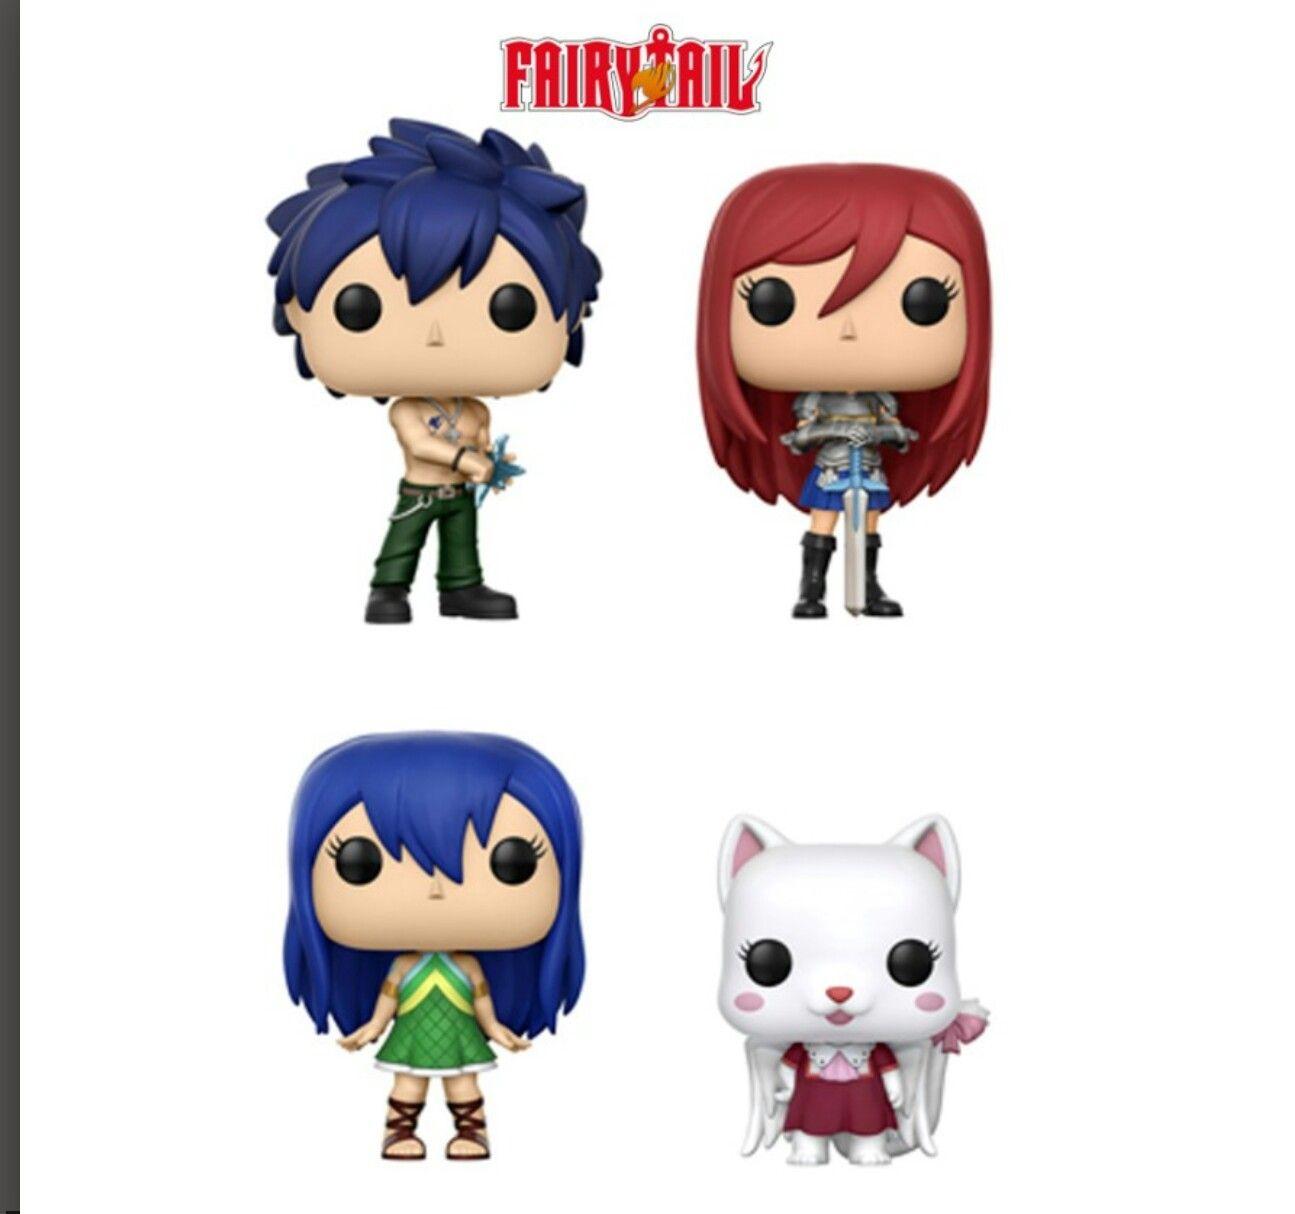 New Fairy Tail Funko Pops